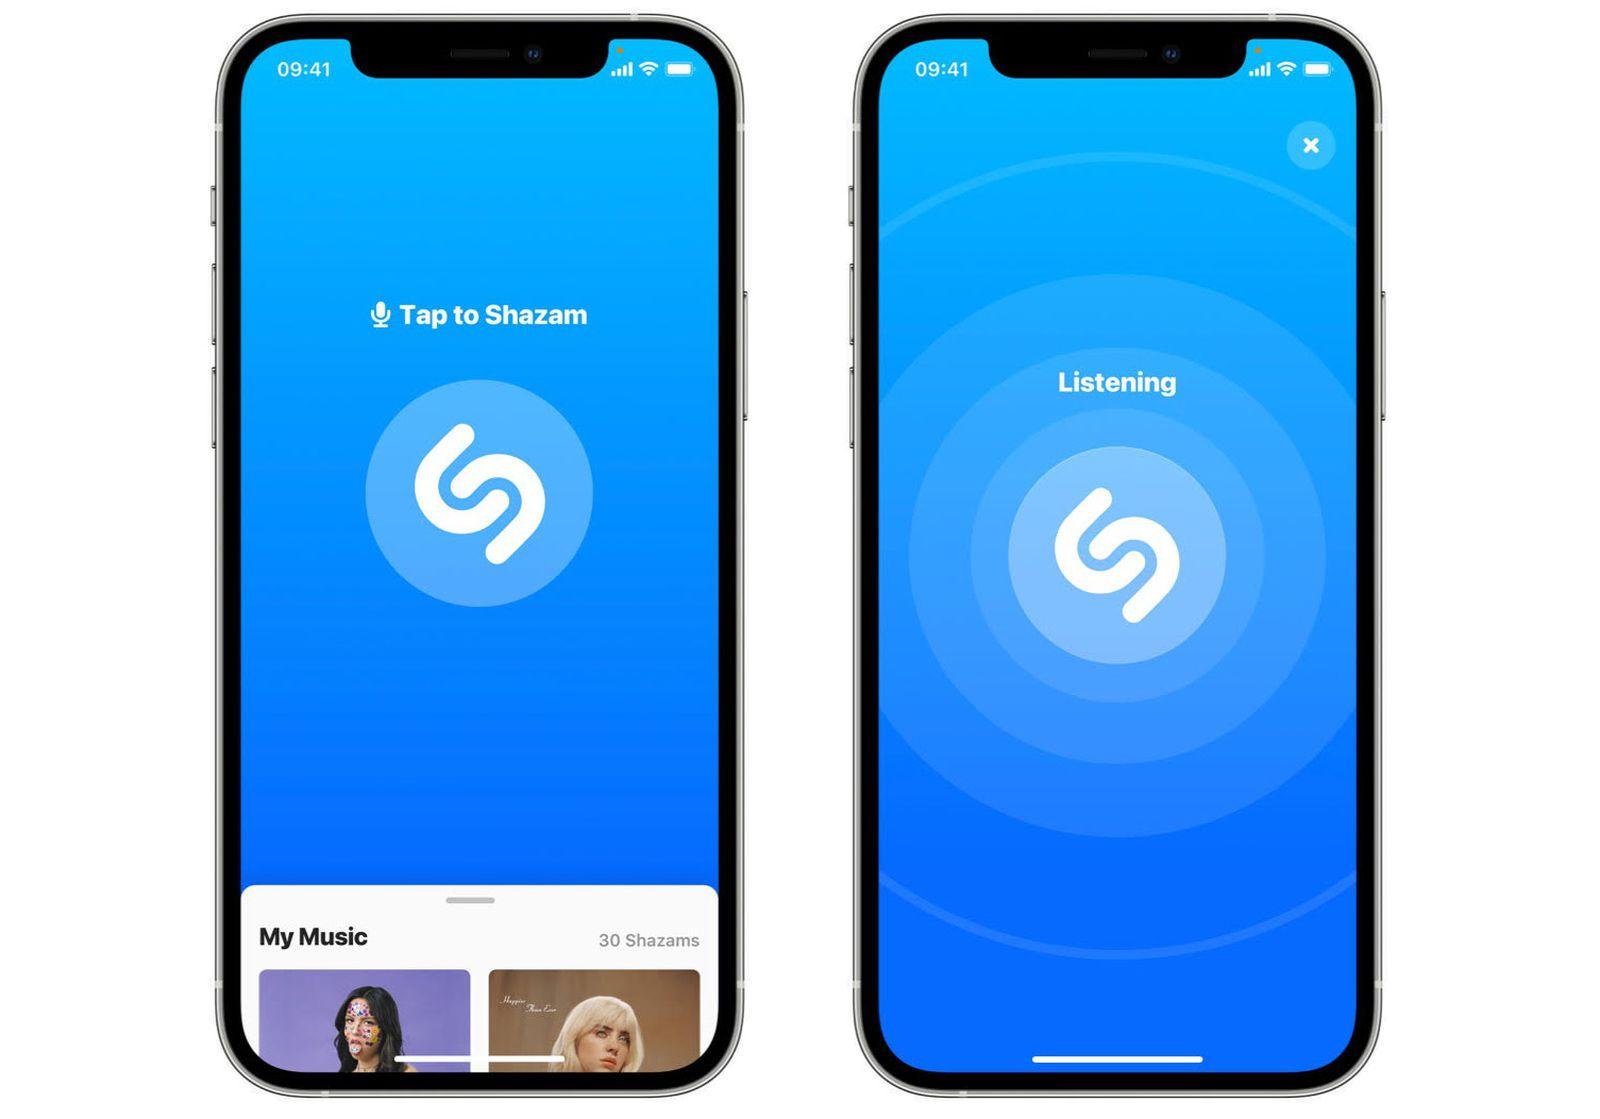 Apple's Shazam Music Discovery Service Surpasses 1 Billion Shazams Per Month